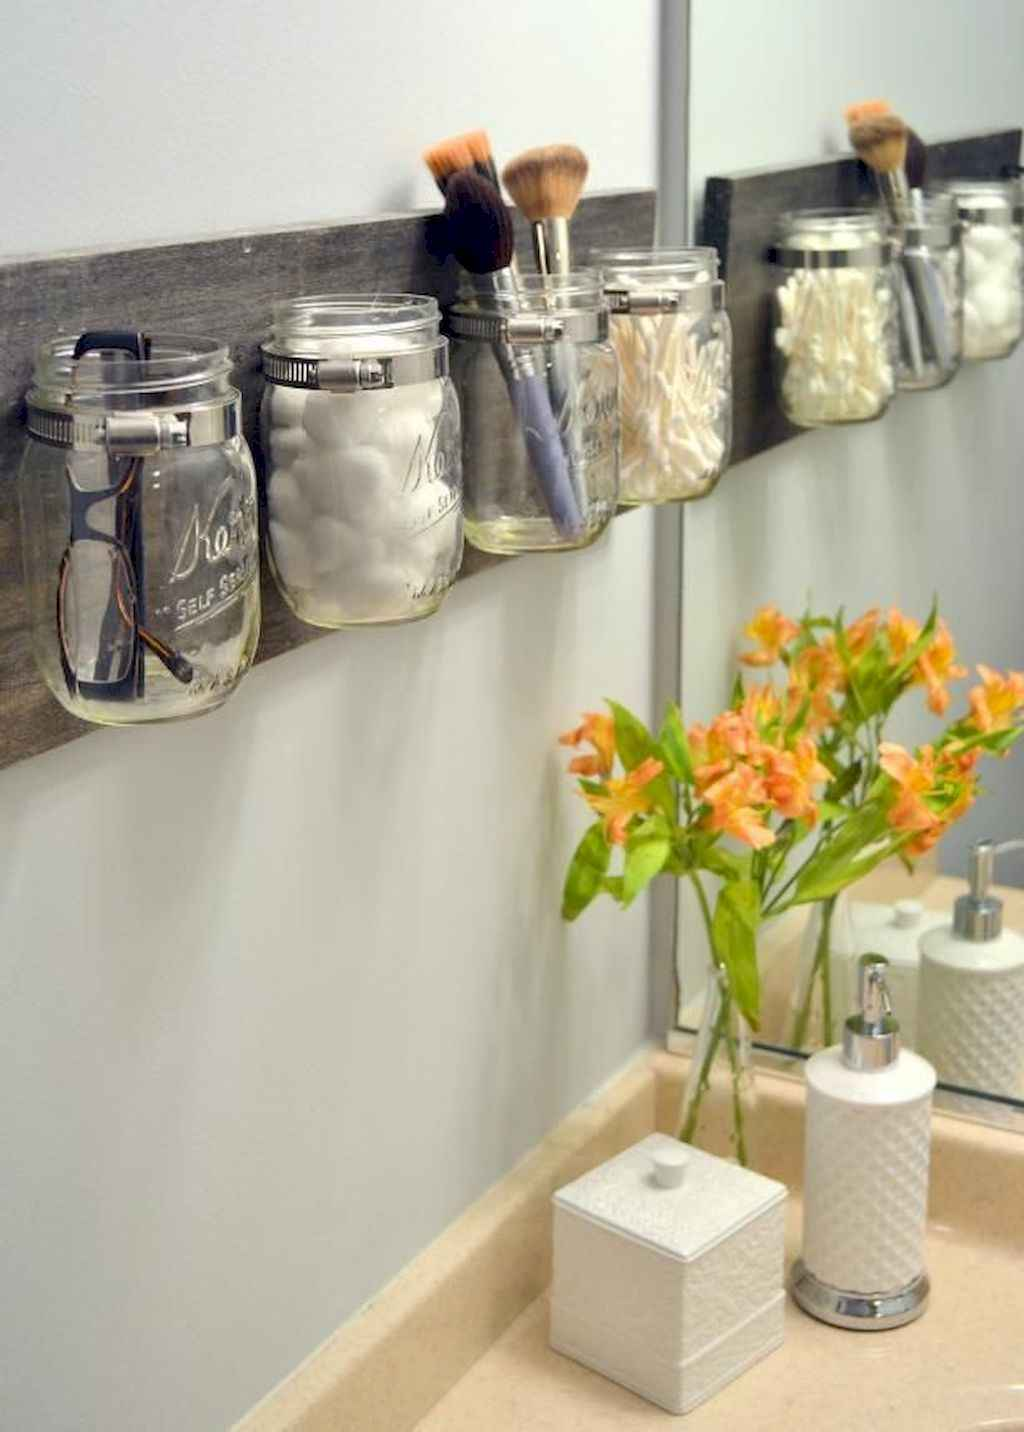 111 Brilliant Small Bathroom Remodel Ideas On A Budget (60)